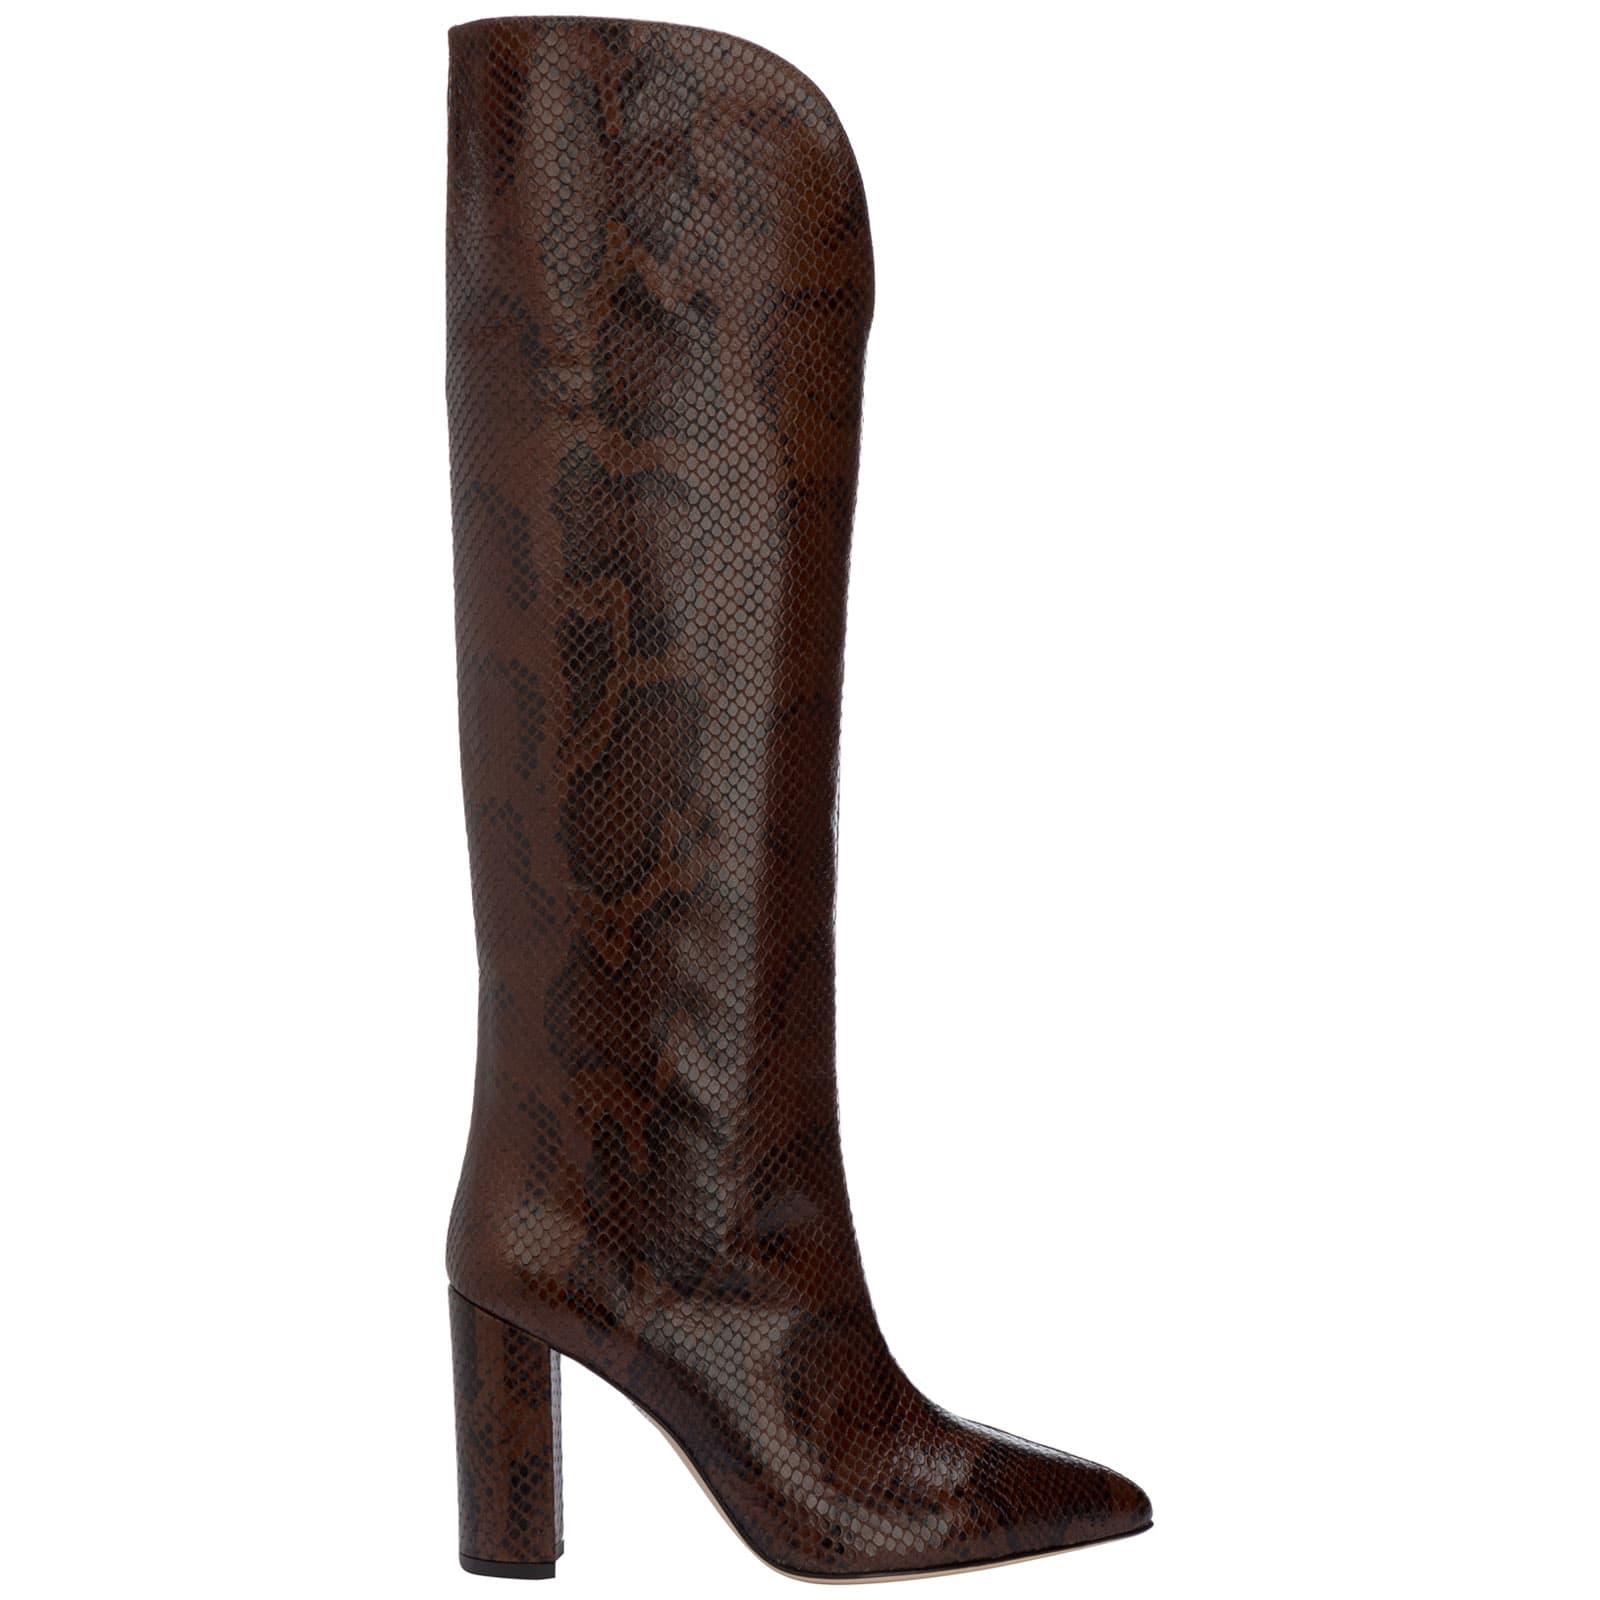 Paris Texas Black Orchid Knee High Boots